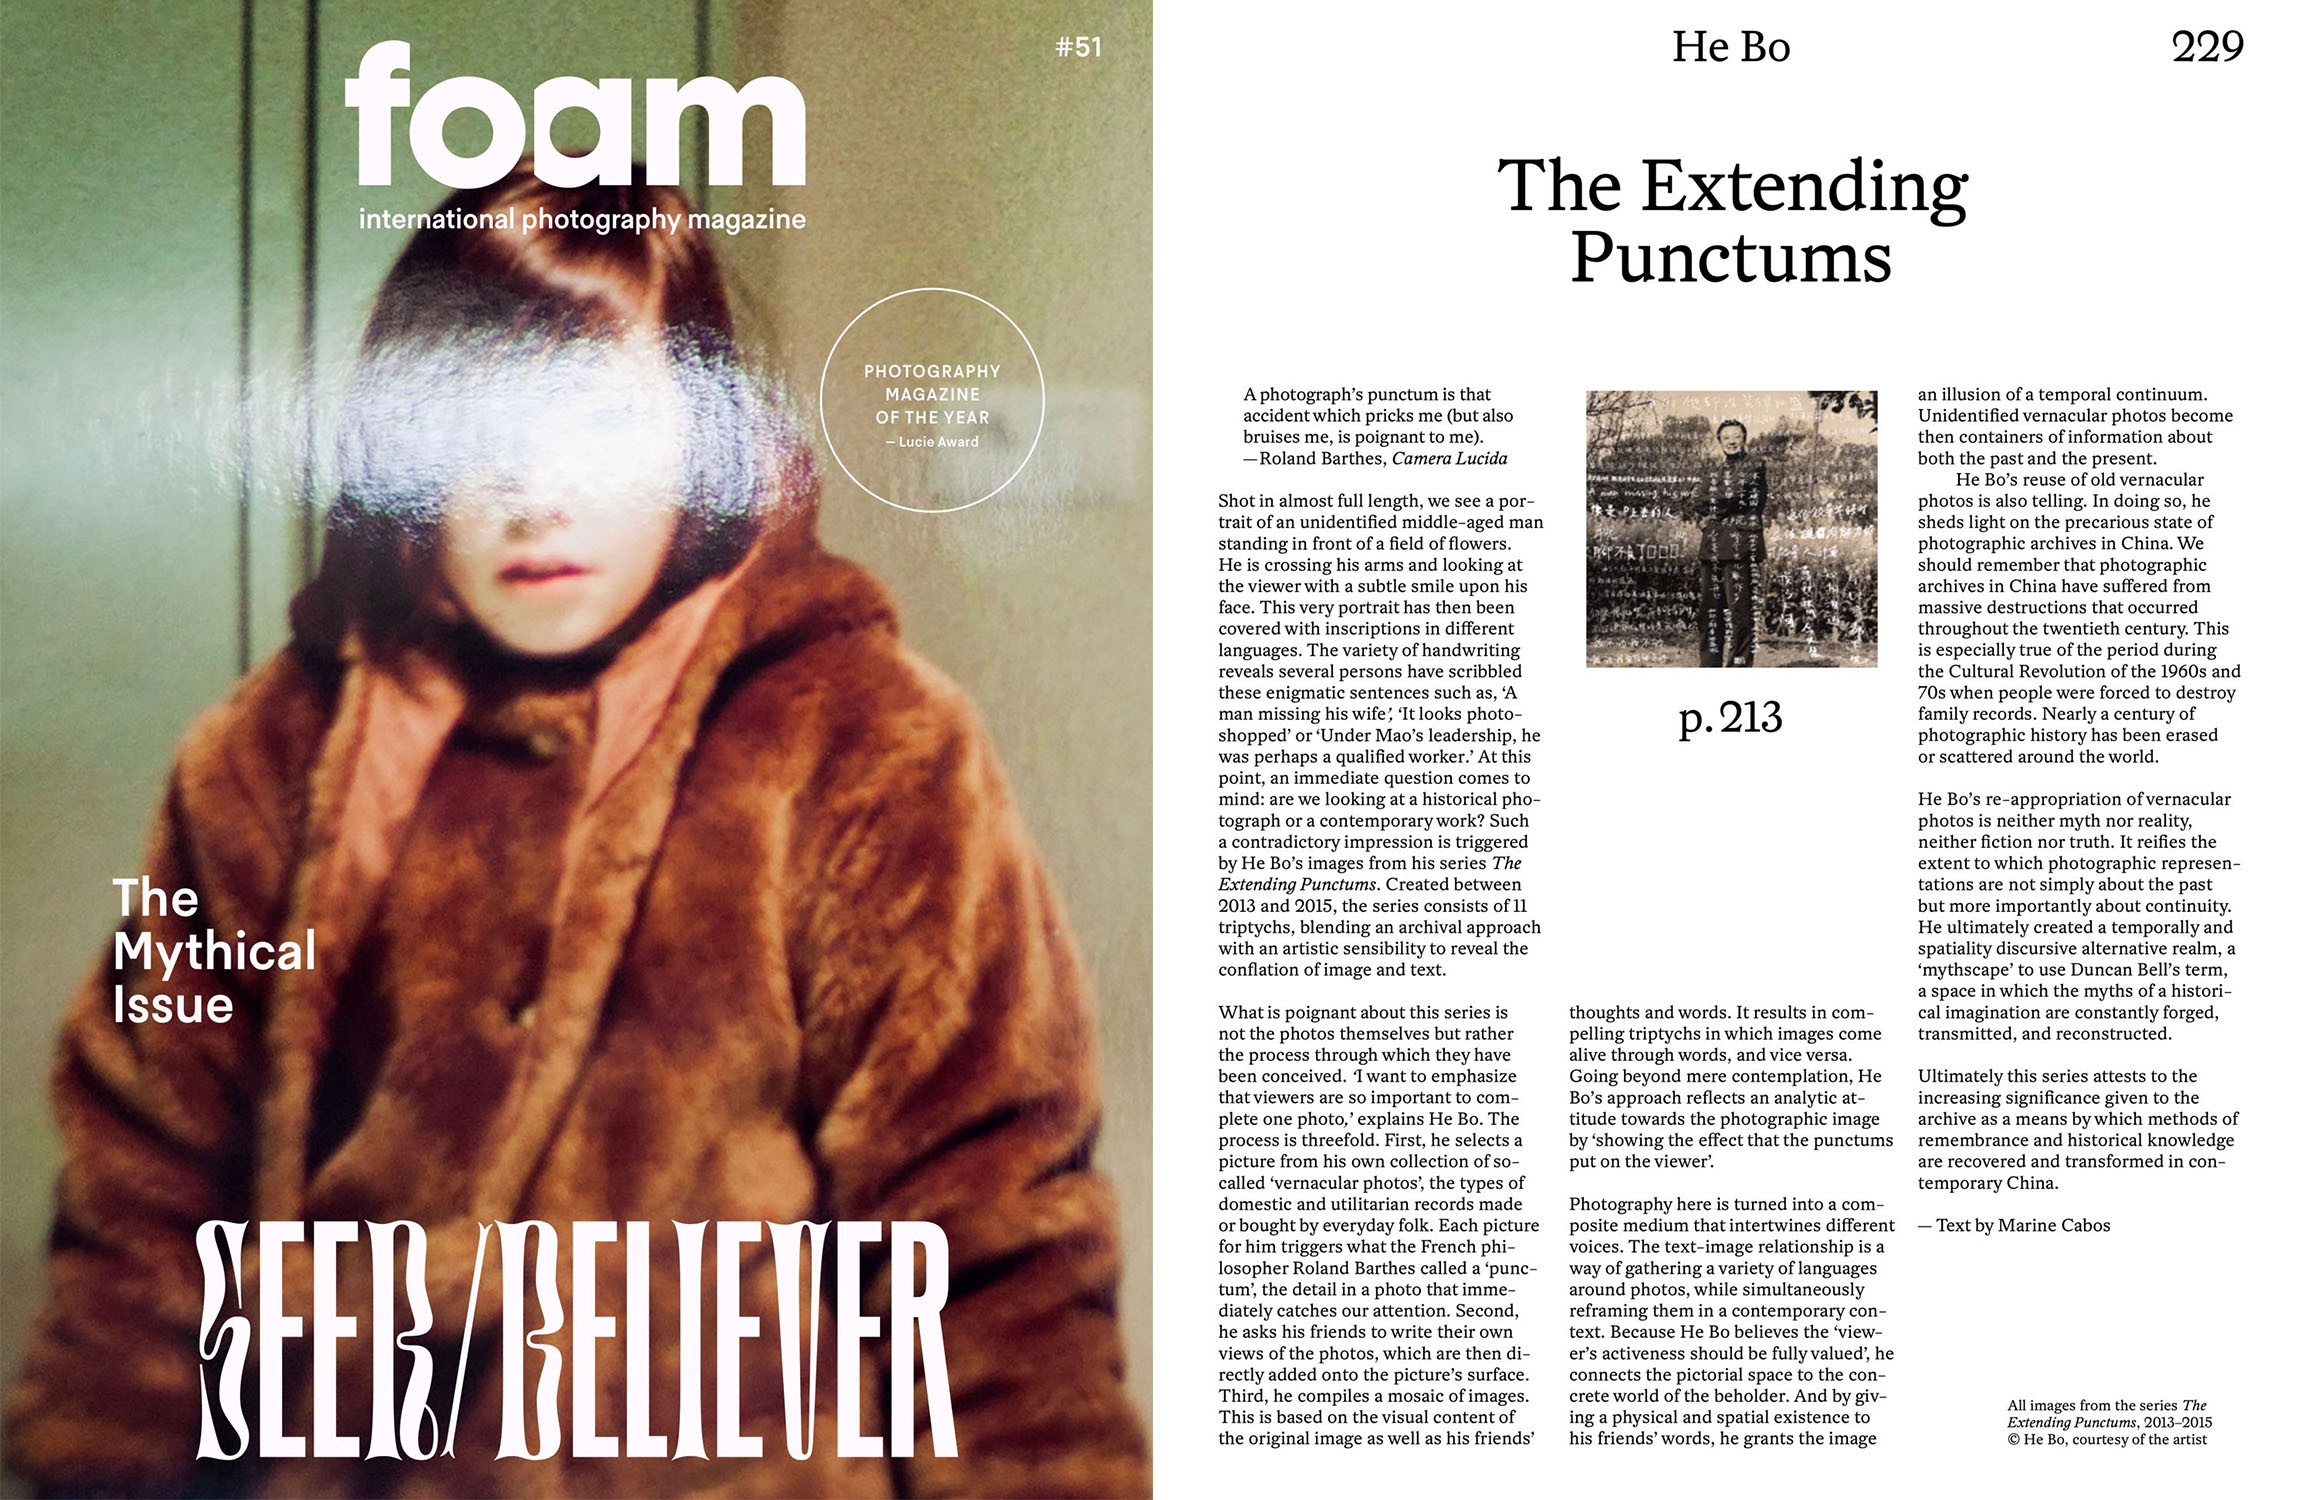 foam-magazine-issue51-he-bo-photography-of-china.jpg